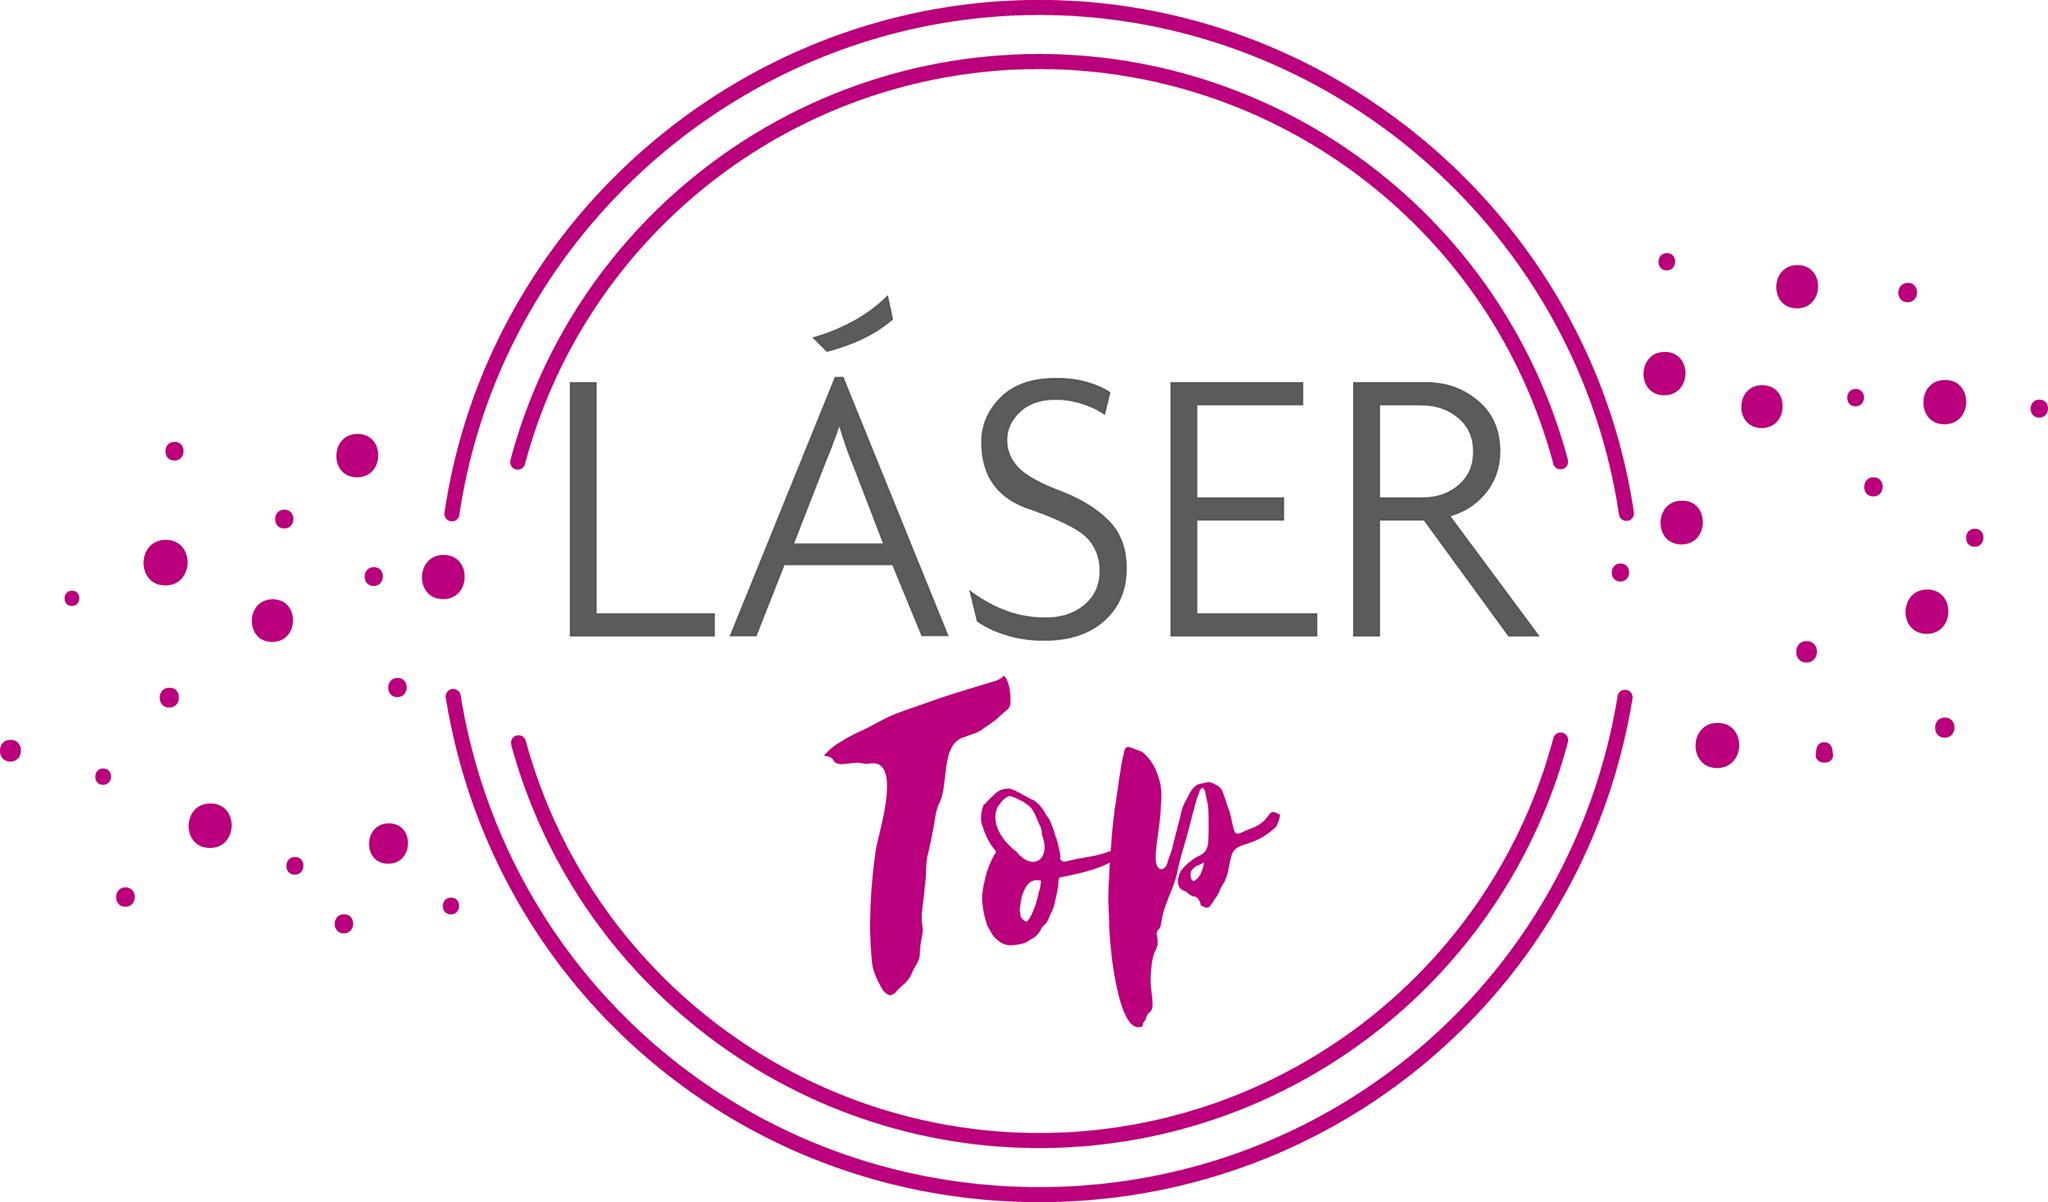 Lasertop